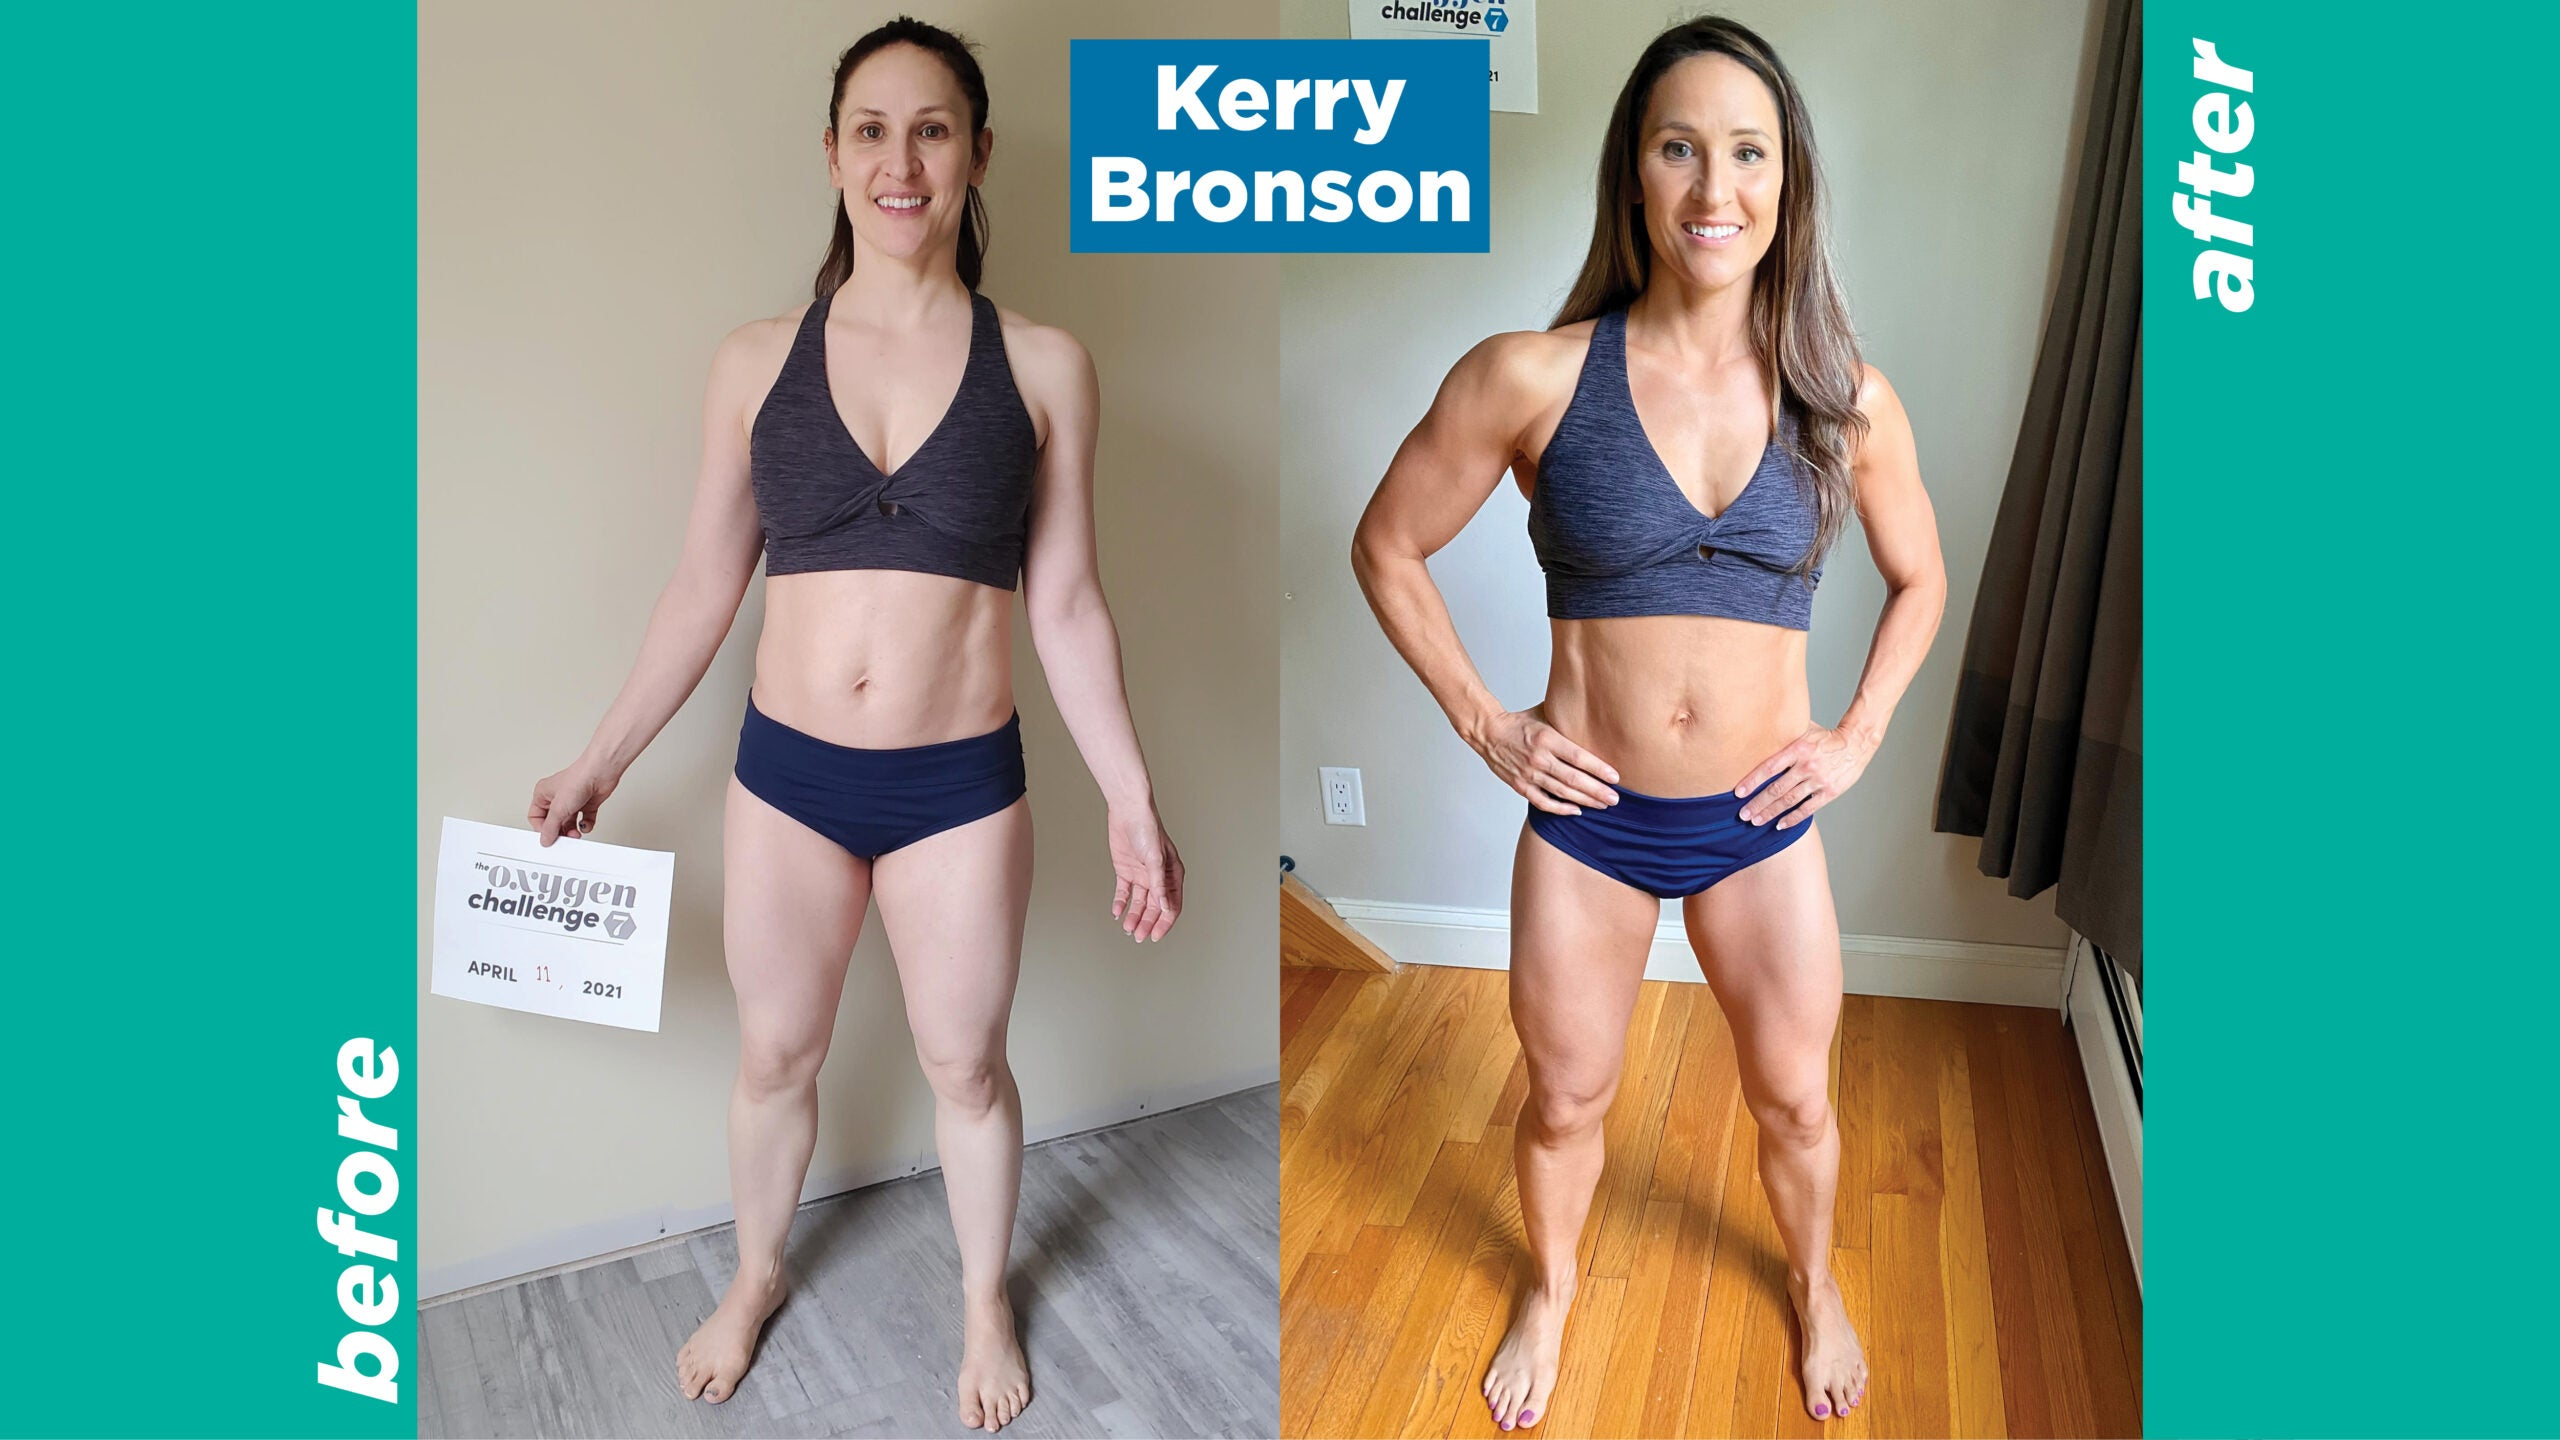 Kerry Bronson